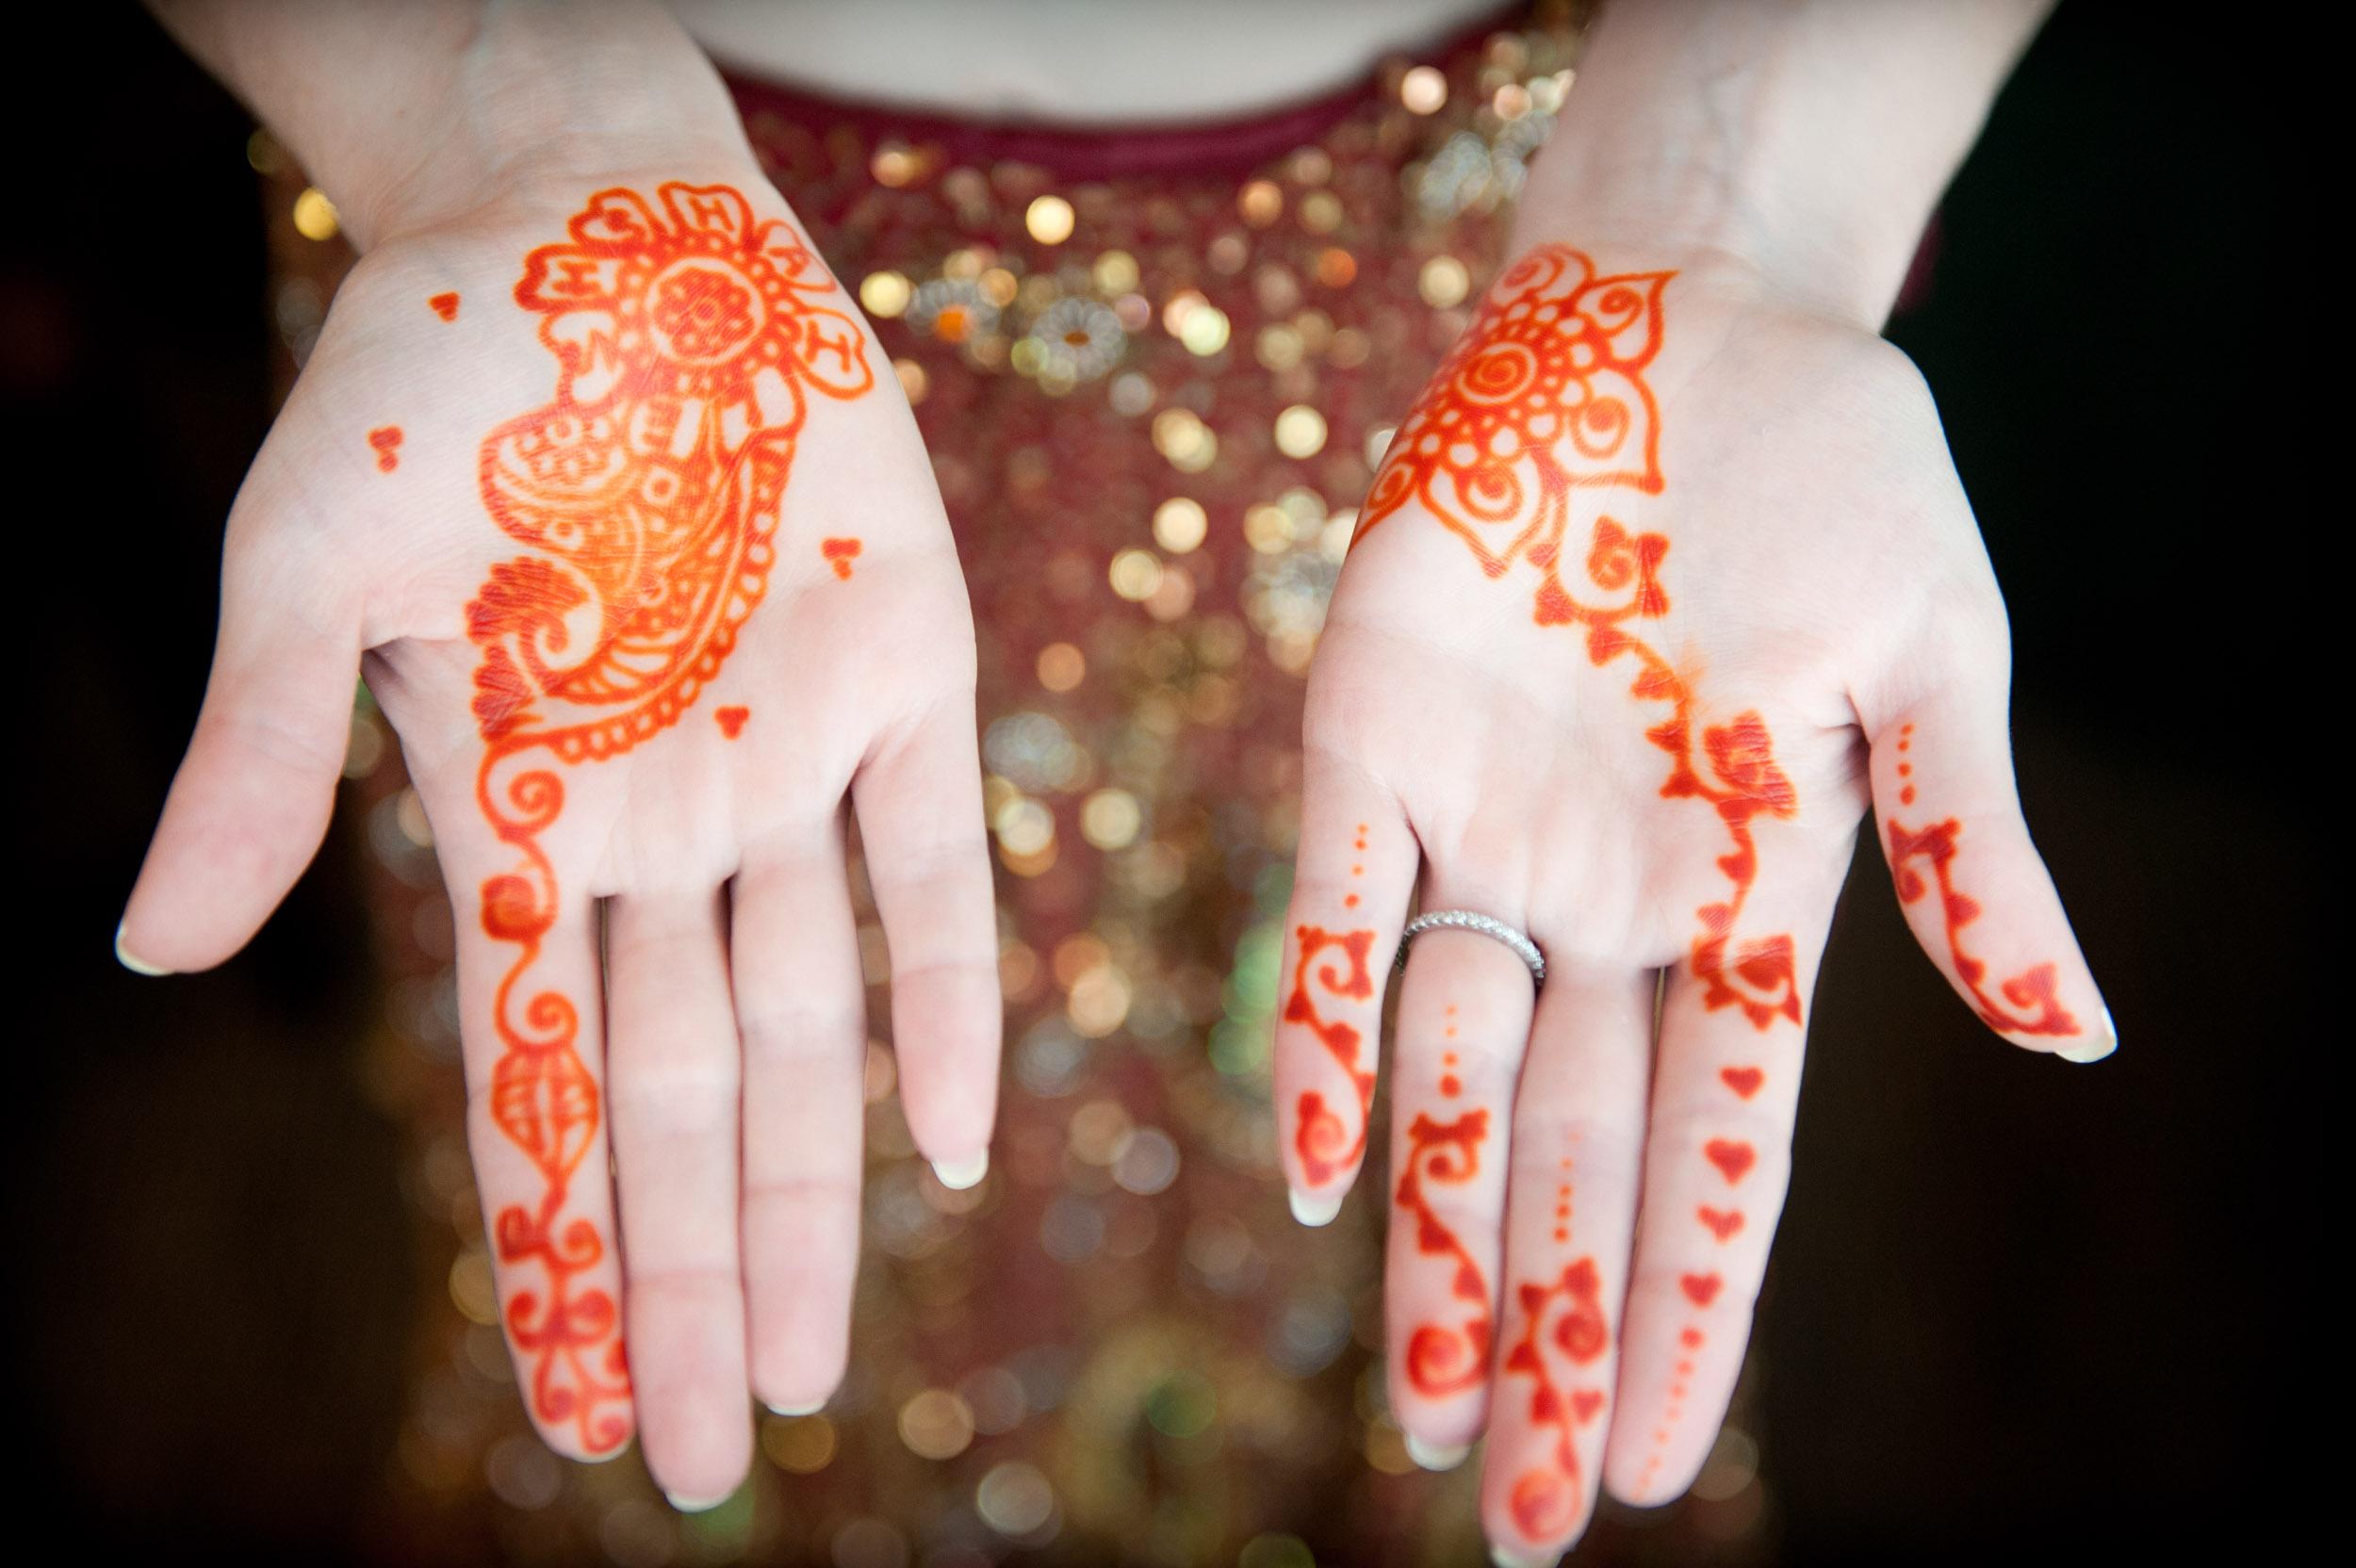 Wedding76Indian_Wedding_hands_cu-2.jpg